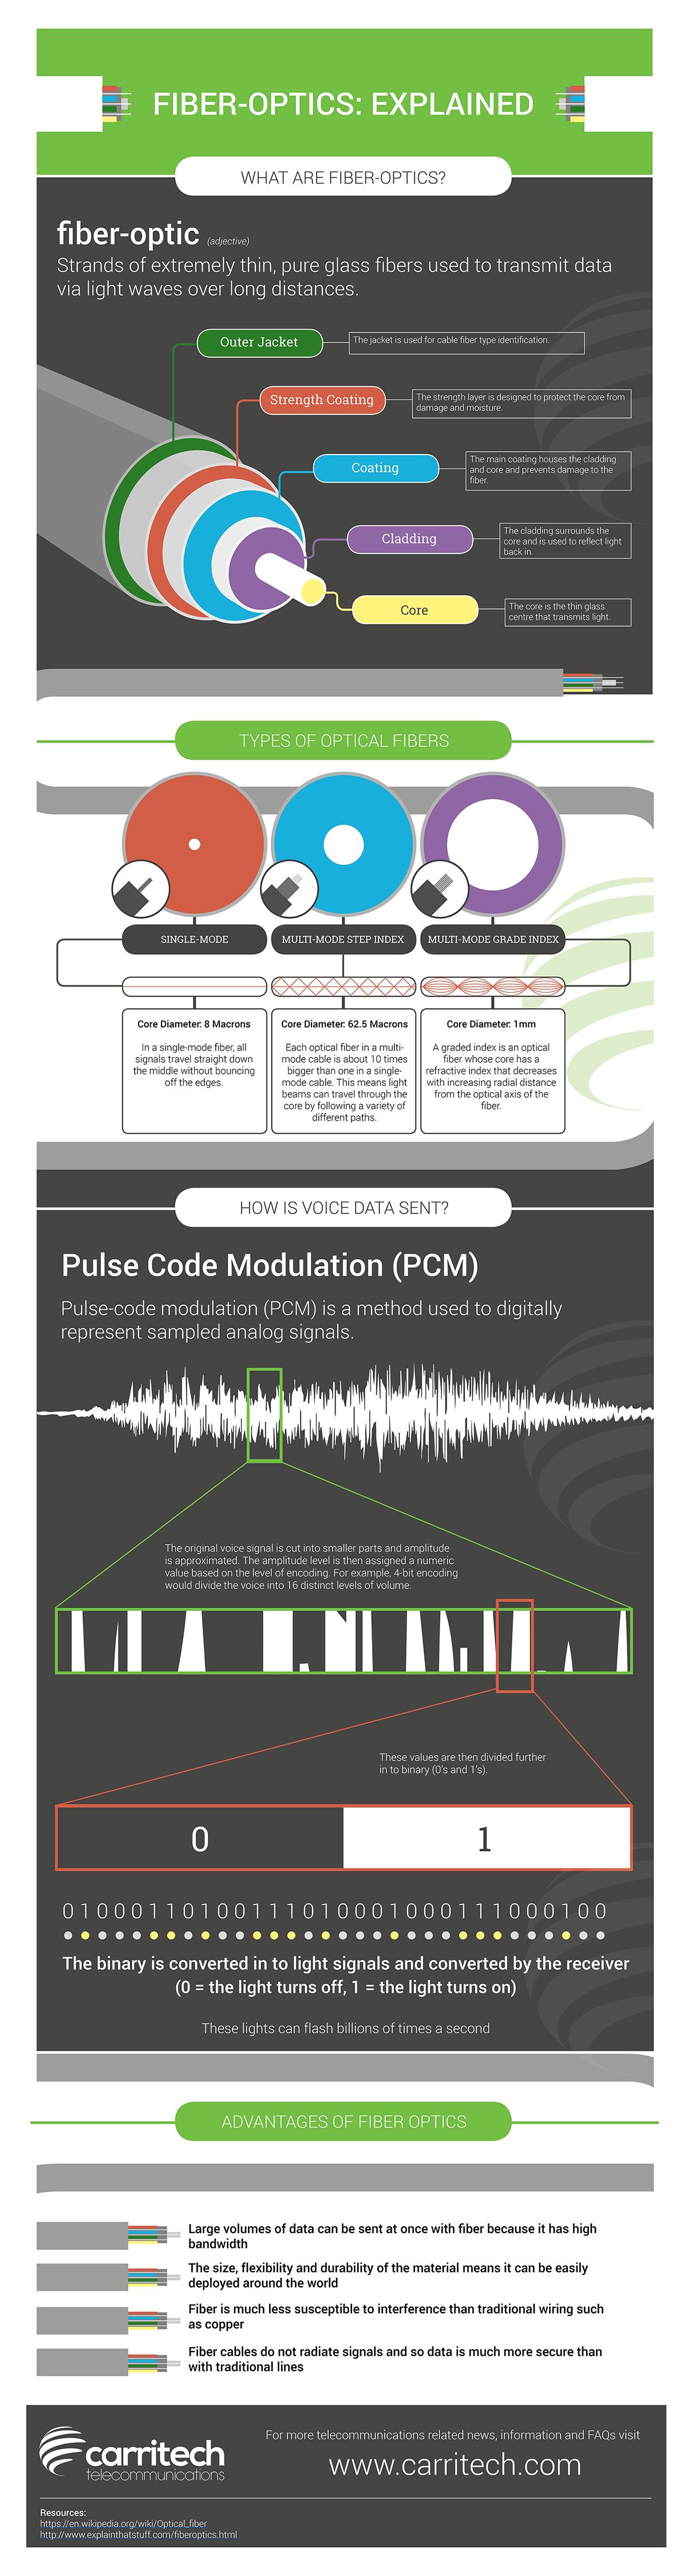 fiber-optics-infographic